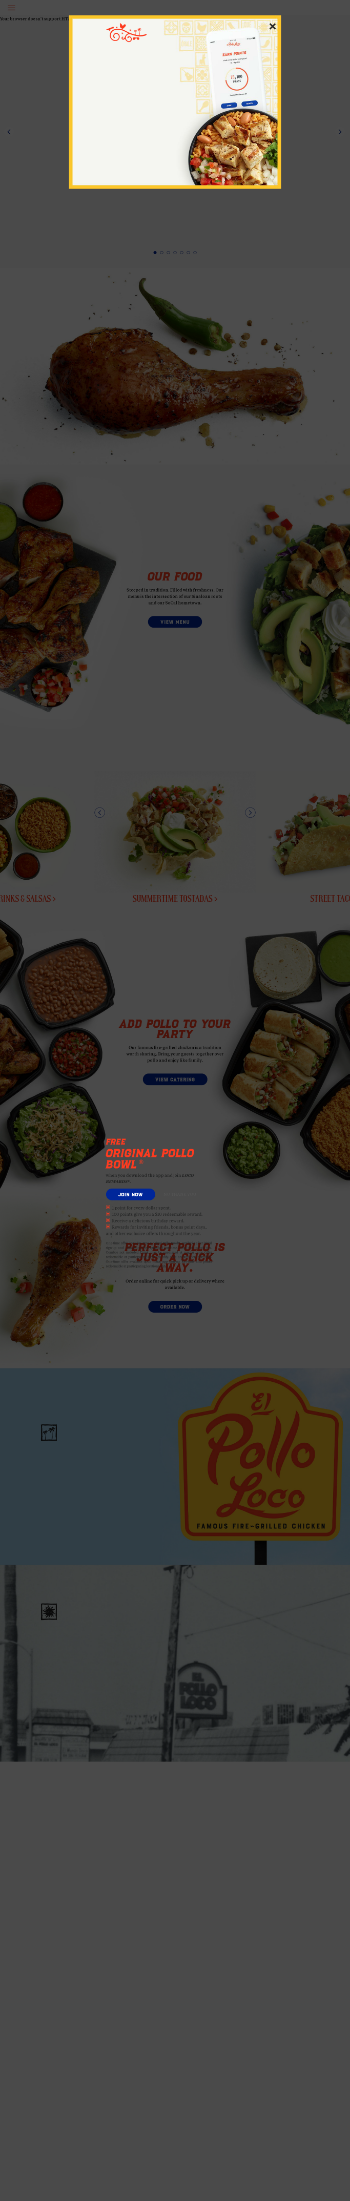 El Pollo Loco Holdings, Inc. Website Screenshot